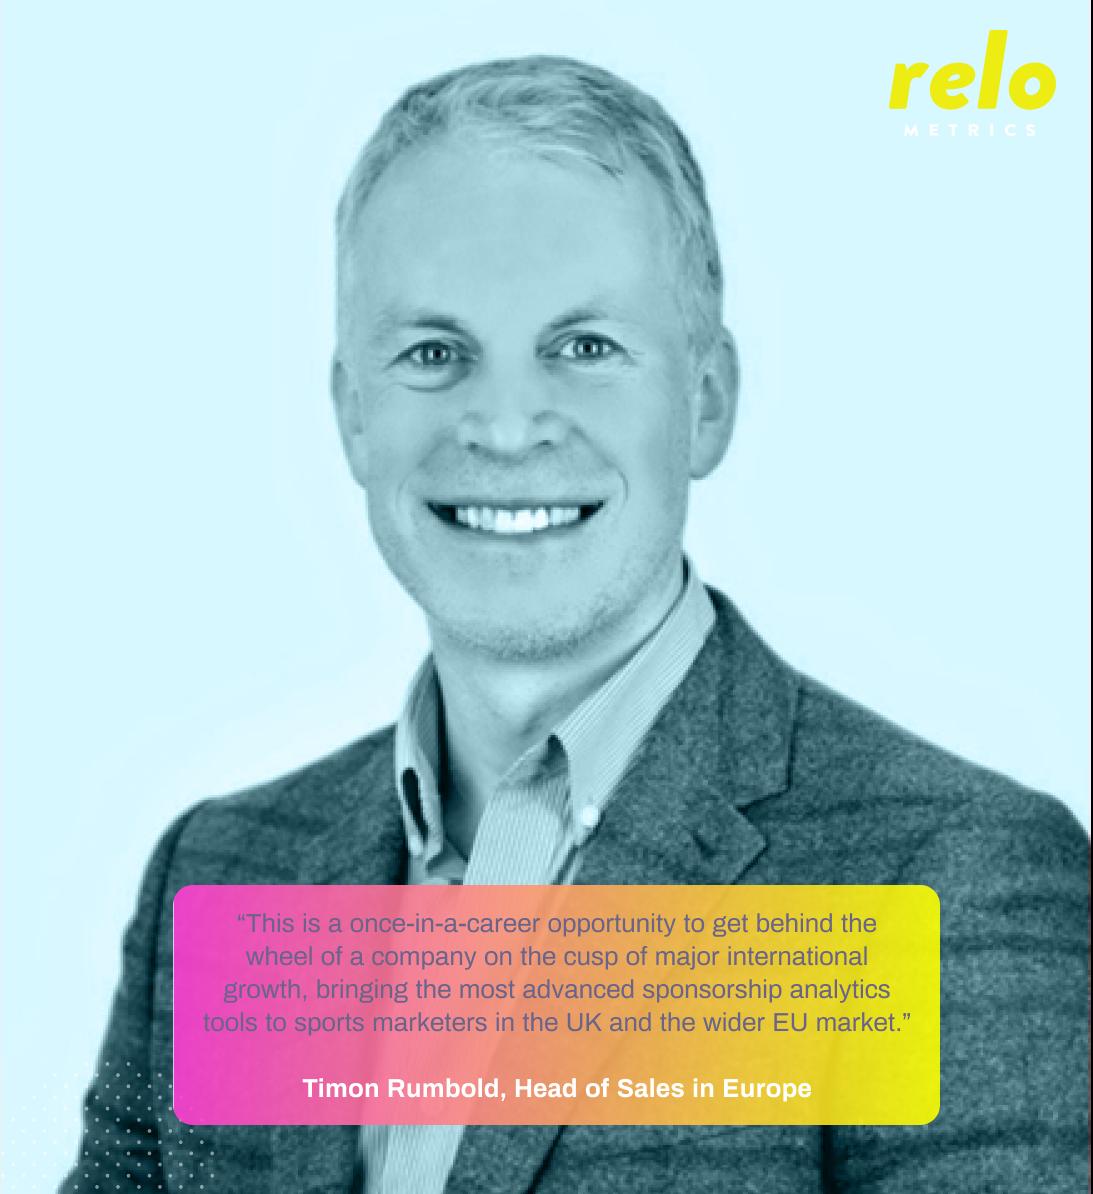 Relo Metrics Announces New Head of Sales for Europe